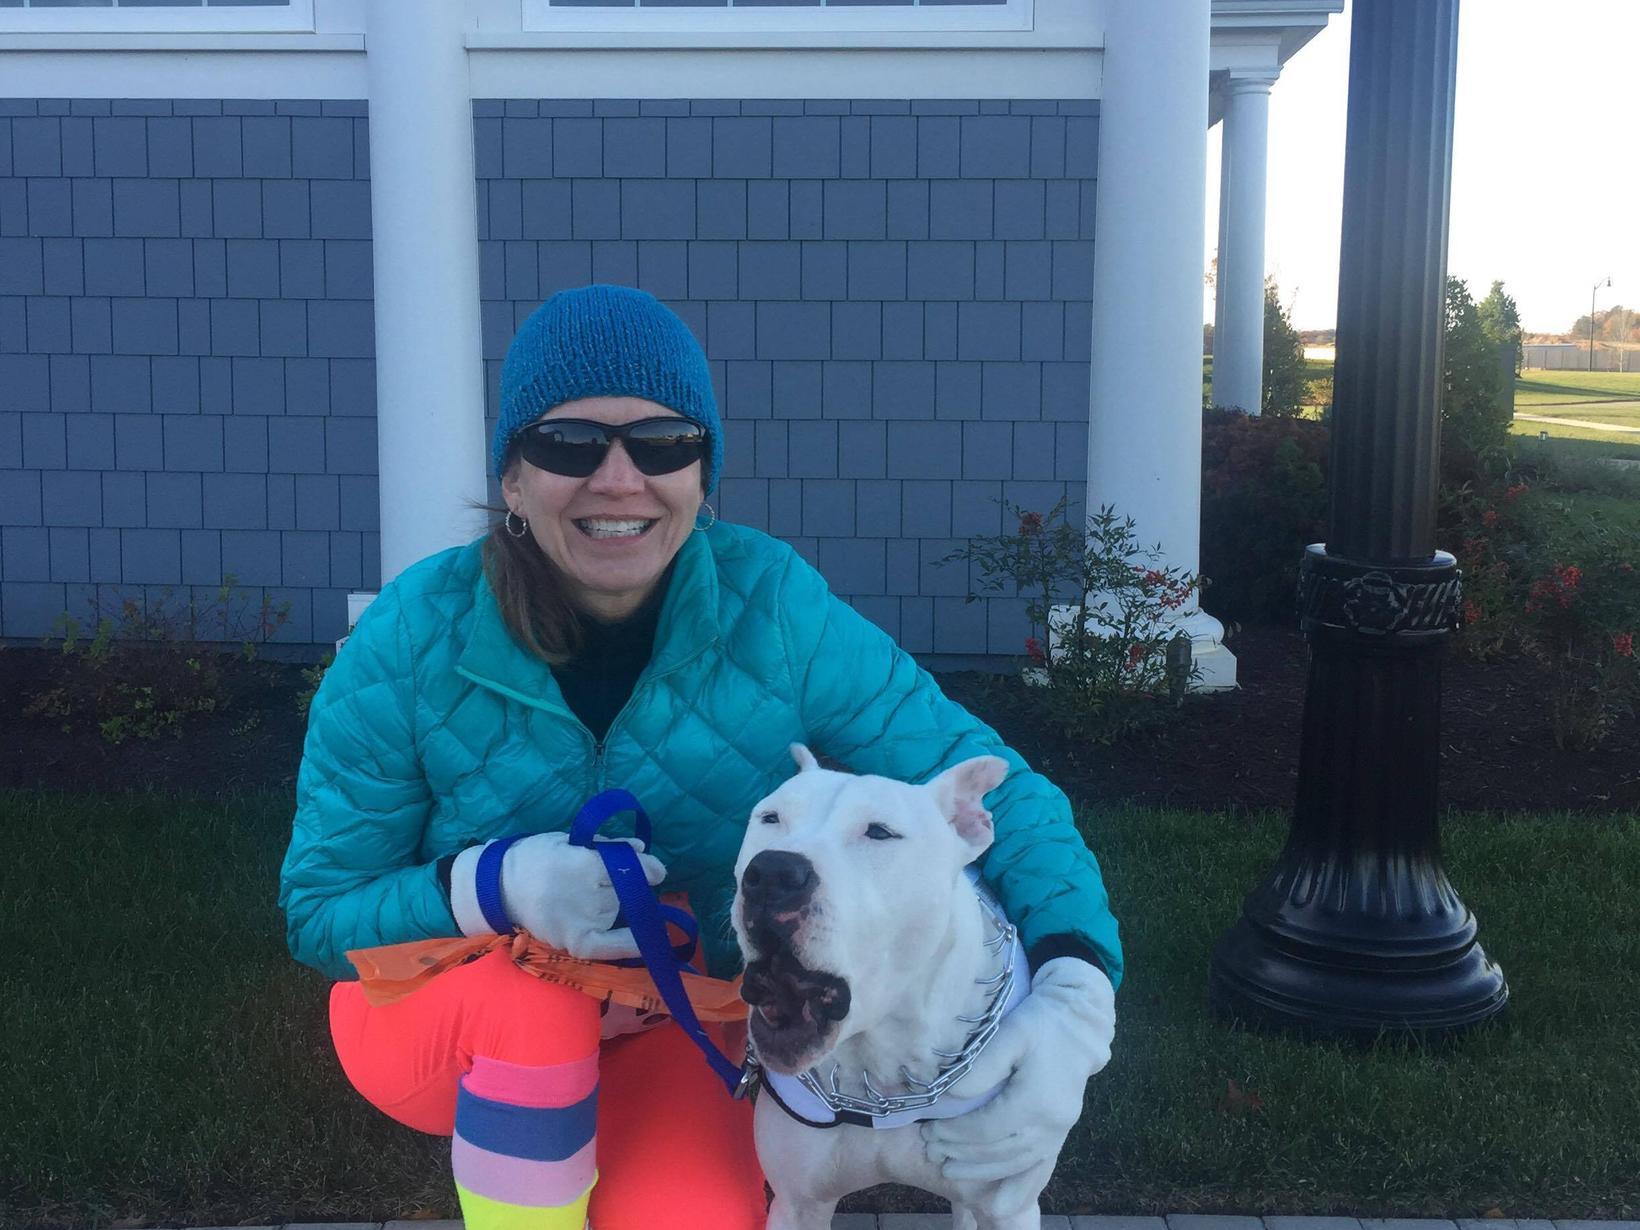 Carolyn (kerri) from Annapolis, Maryland, United States